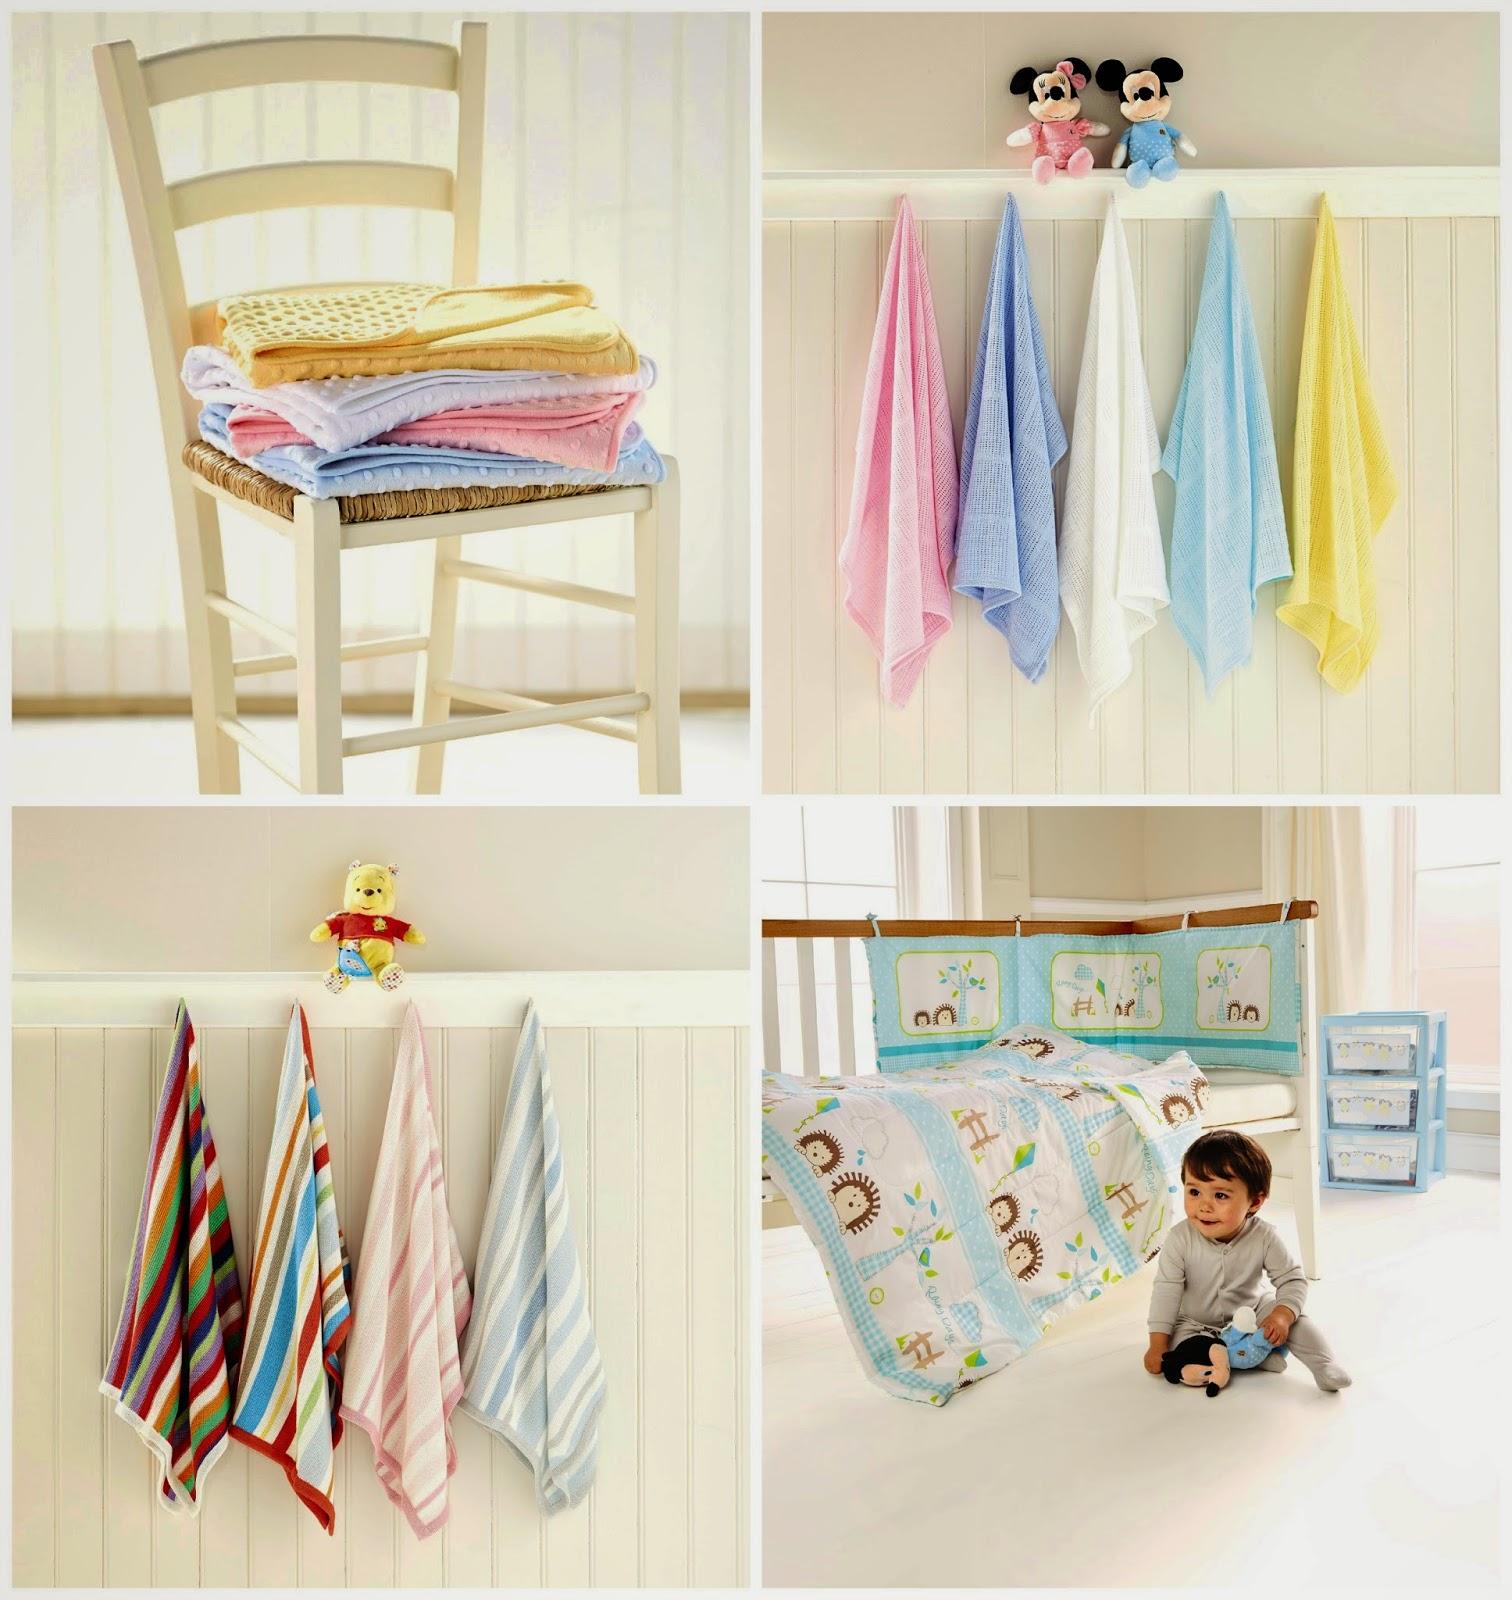 Aldi Knitting Pattern Baby Blanket : Handbags To Change Bags: Aldis Baby & Toddler Event